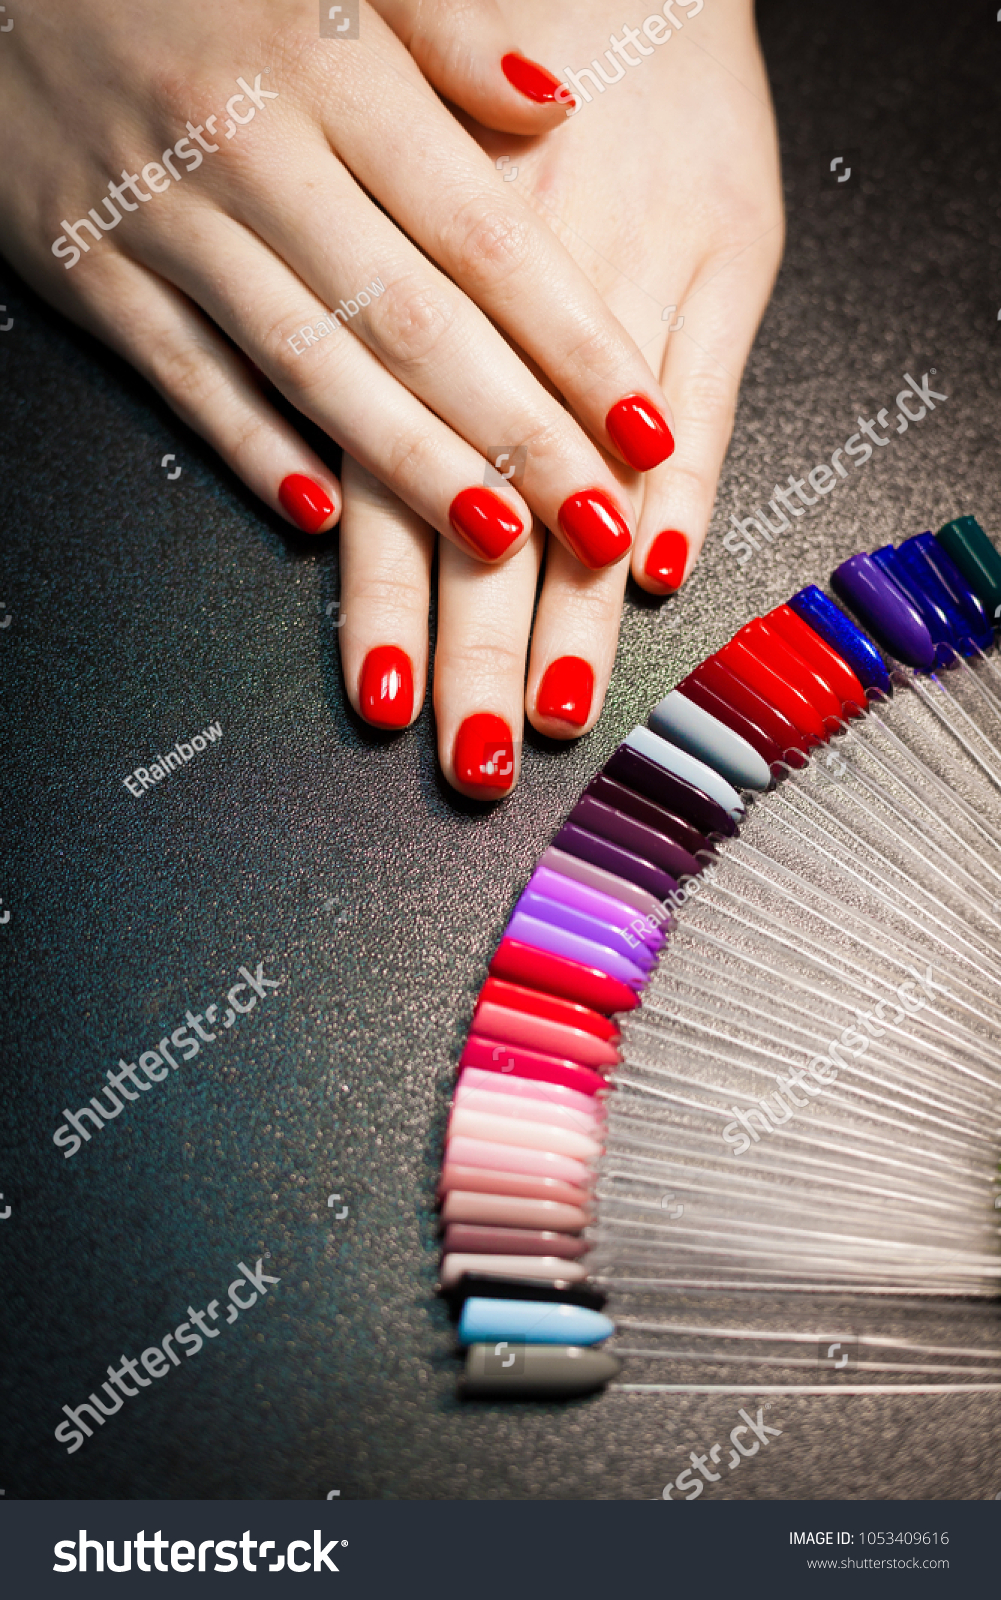 Professional Manicure Salon Red Color Decorative Stock Photo ...